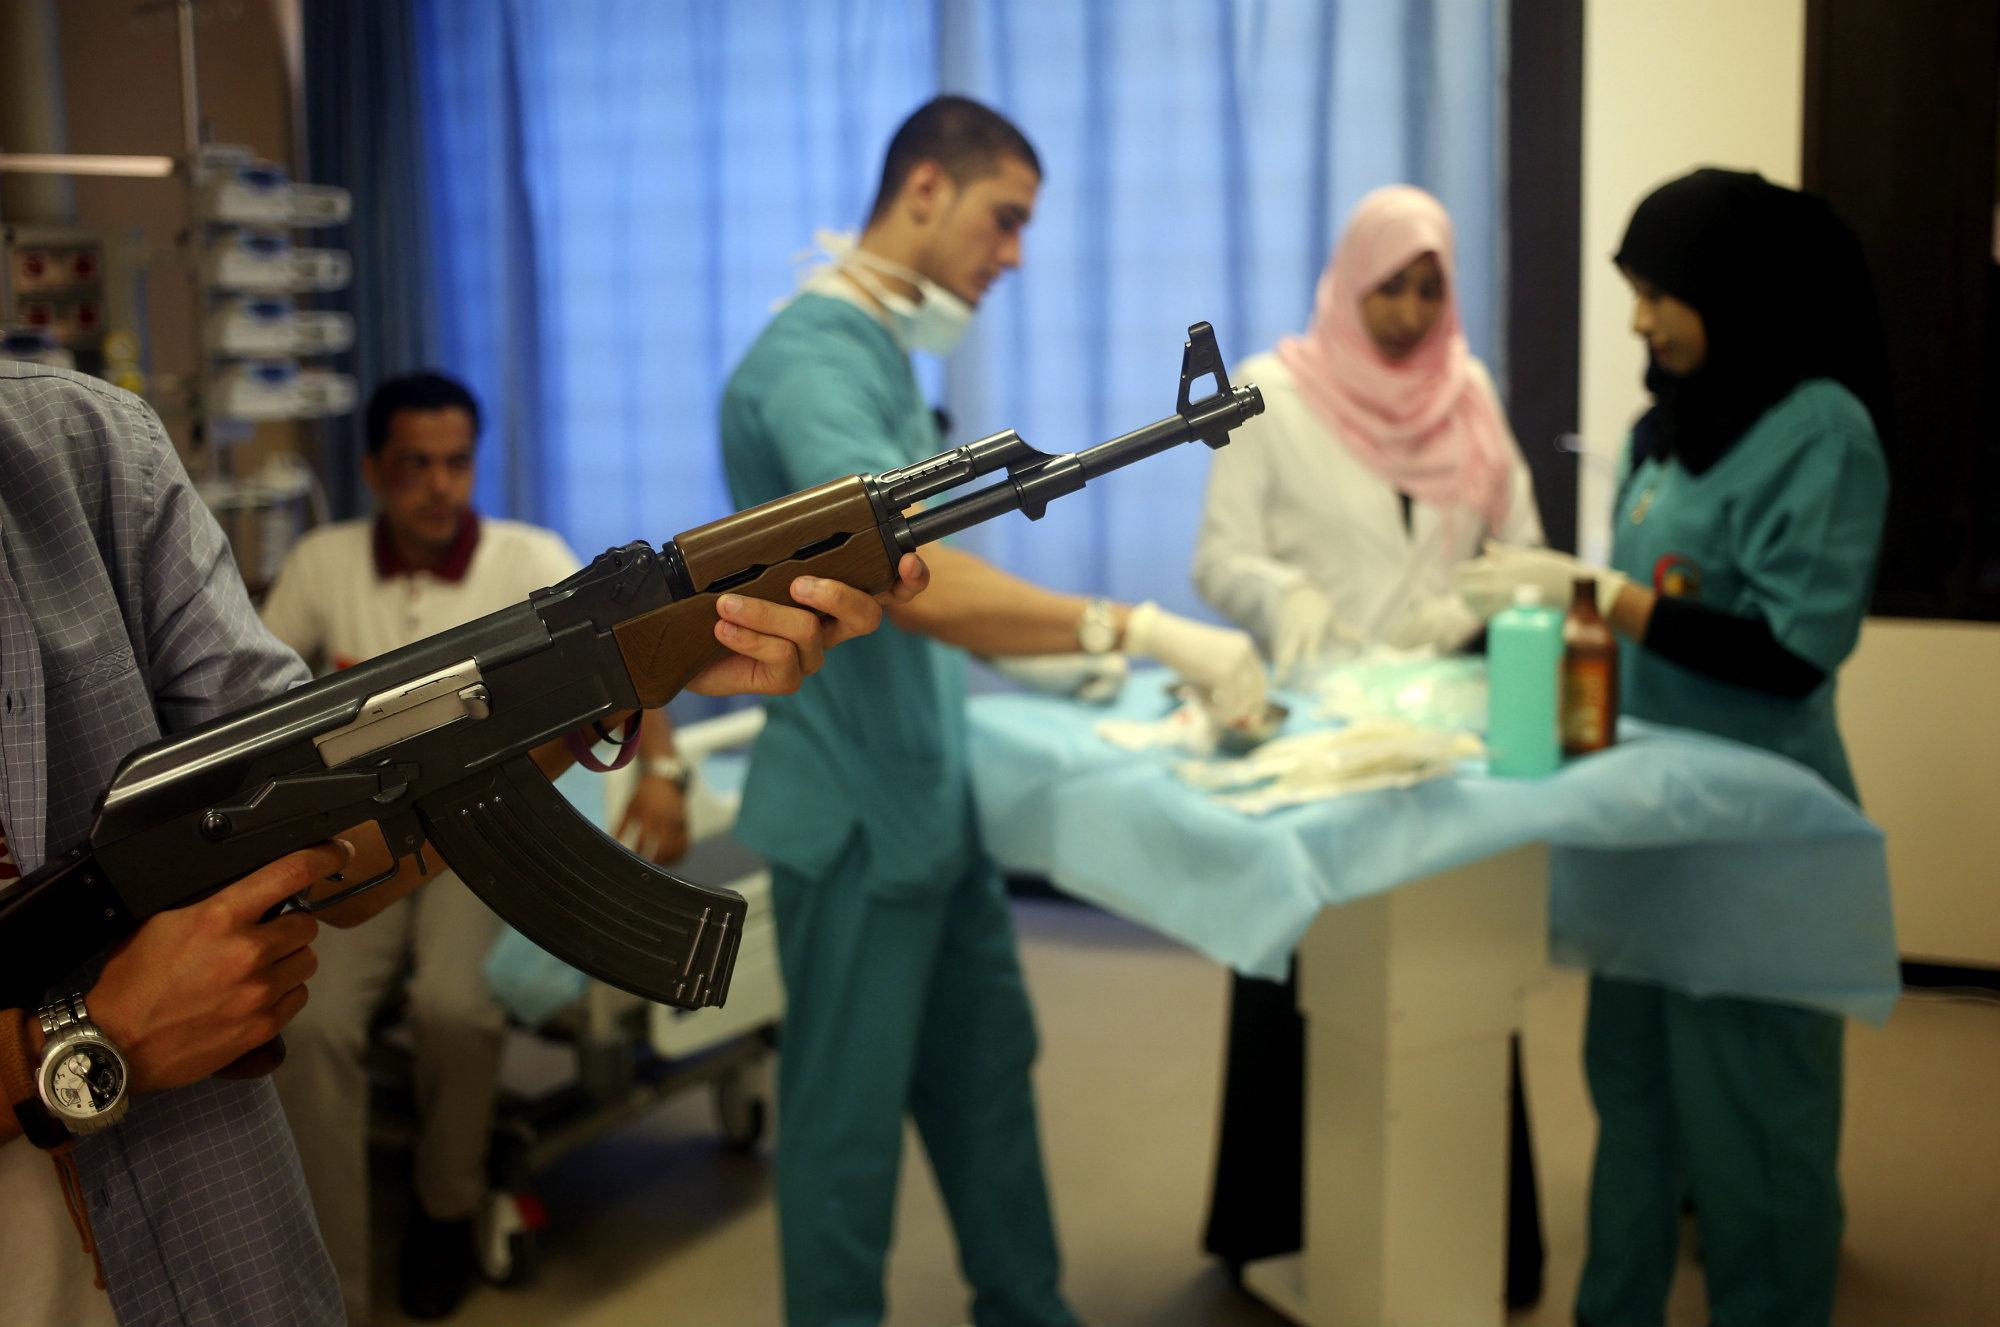 Muslim, Arab, Youth ISIS